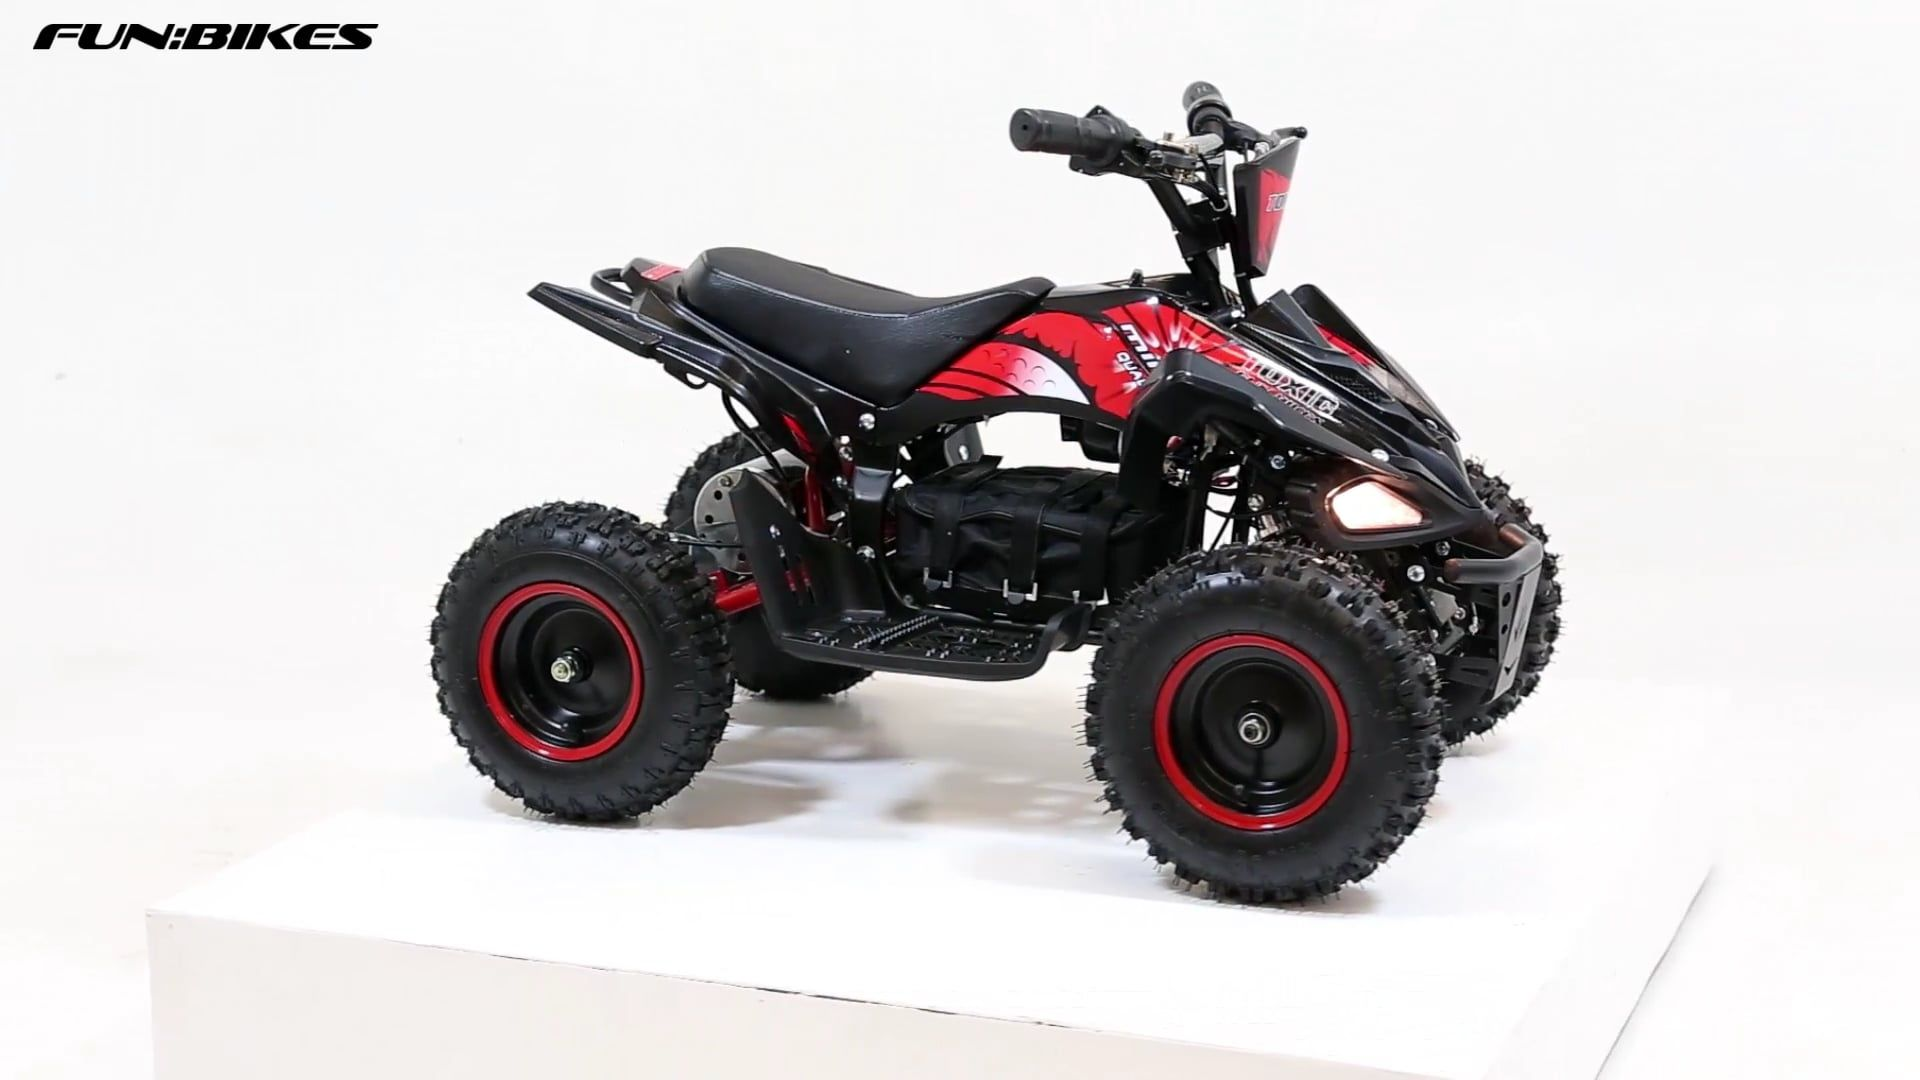 Funbikes Toxic 800w Black Red Kids Electric Mini Quad Bike With